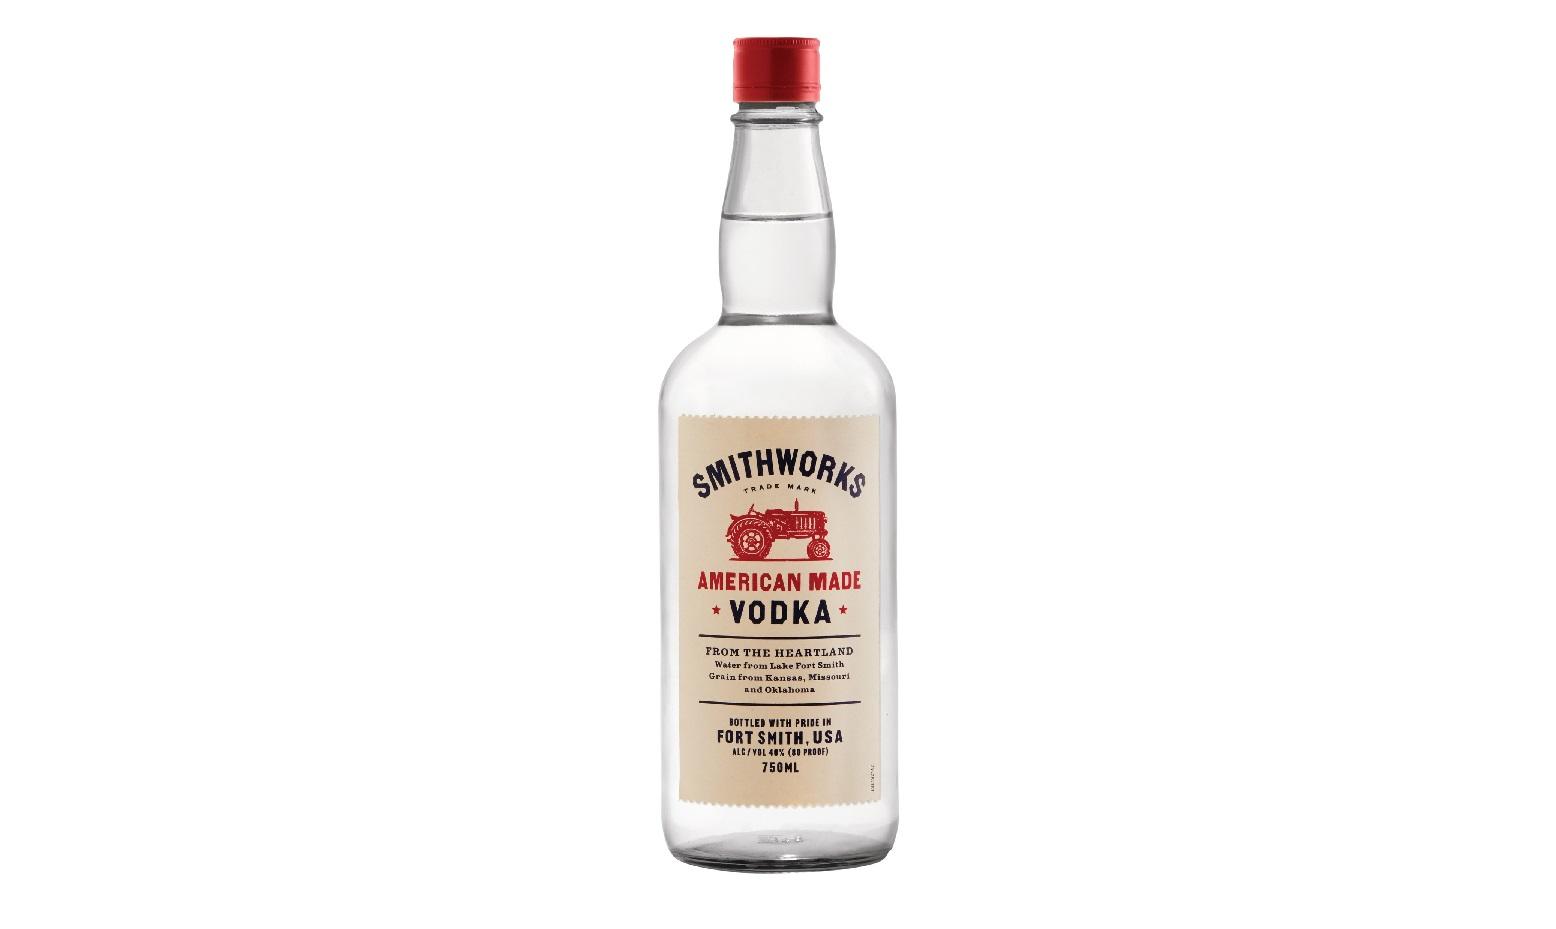 Smithworks Vodka Expanding To The Keystone State